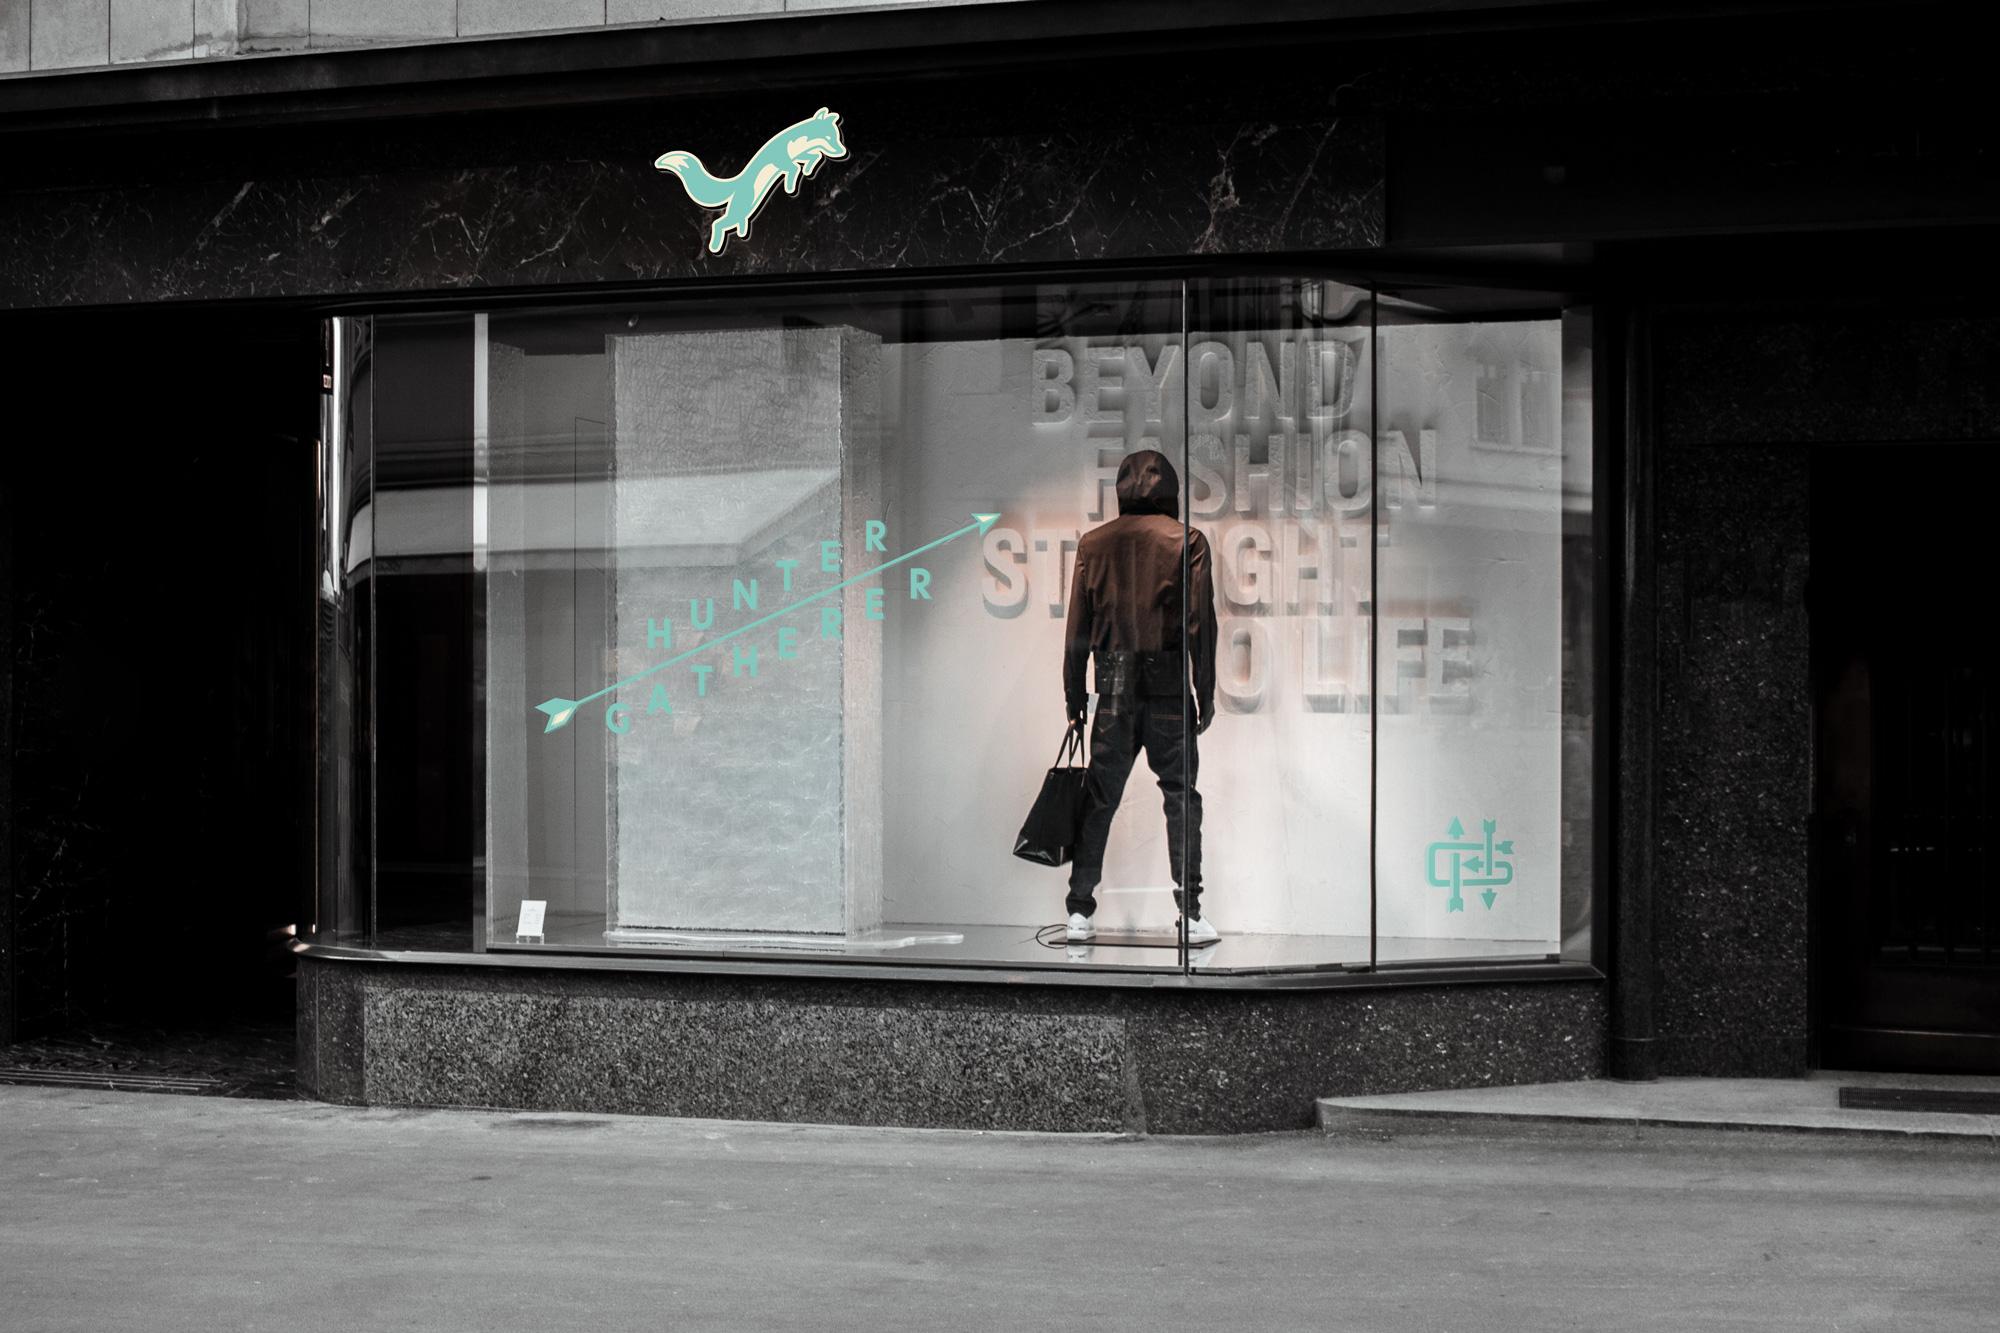 Hunter Gatherer Shopfront